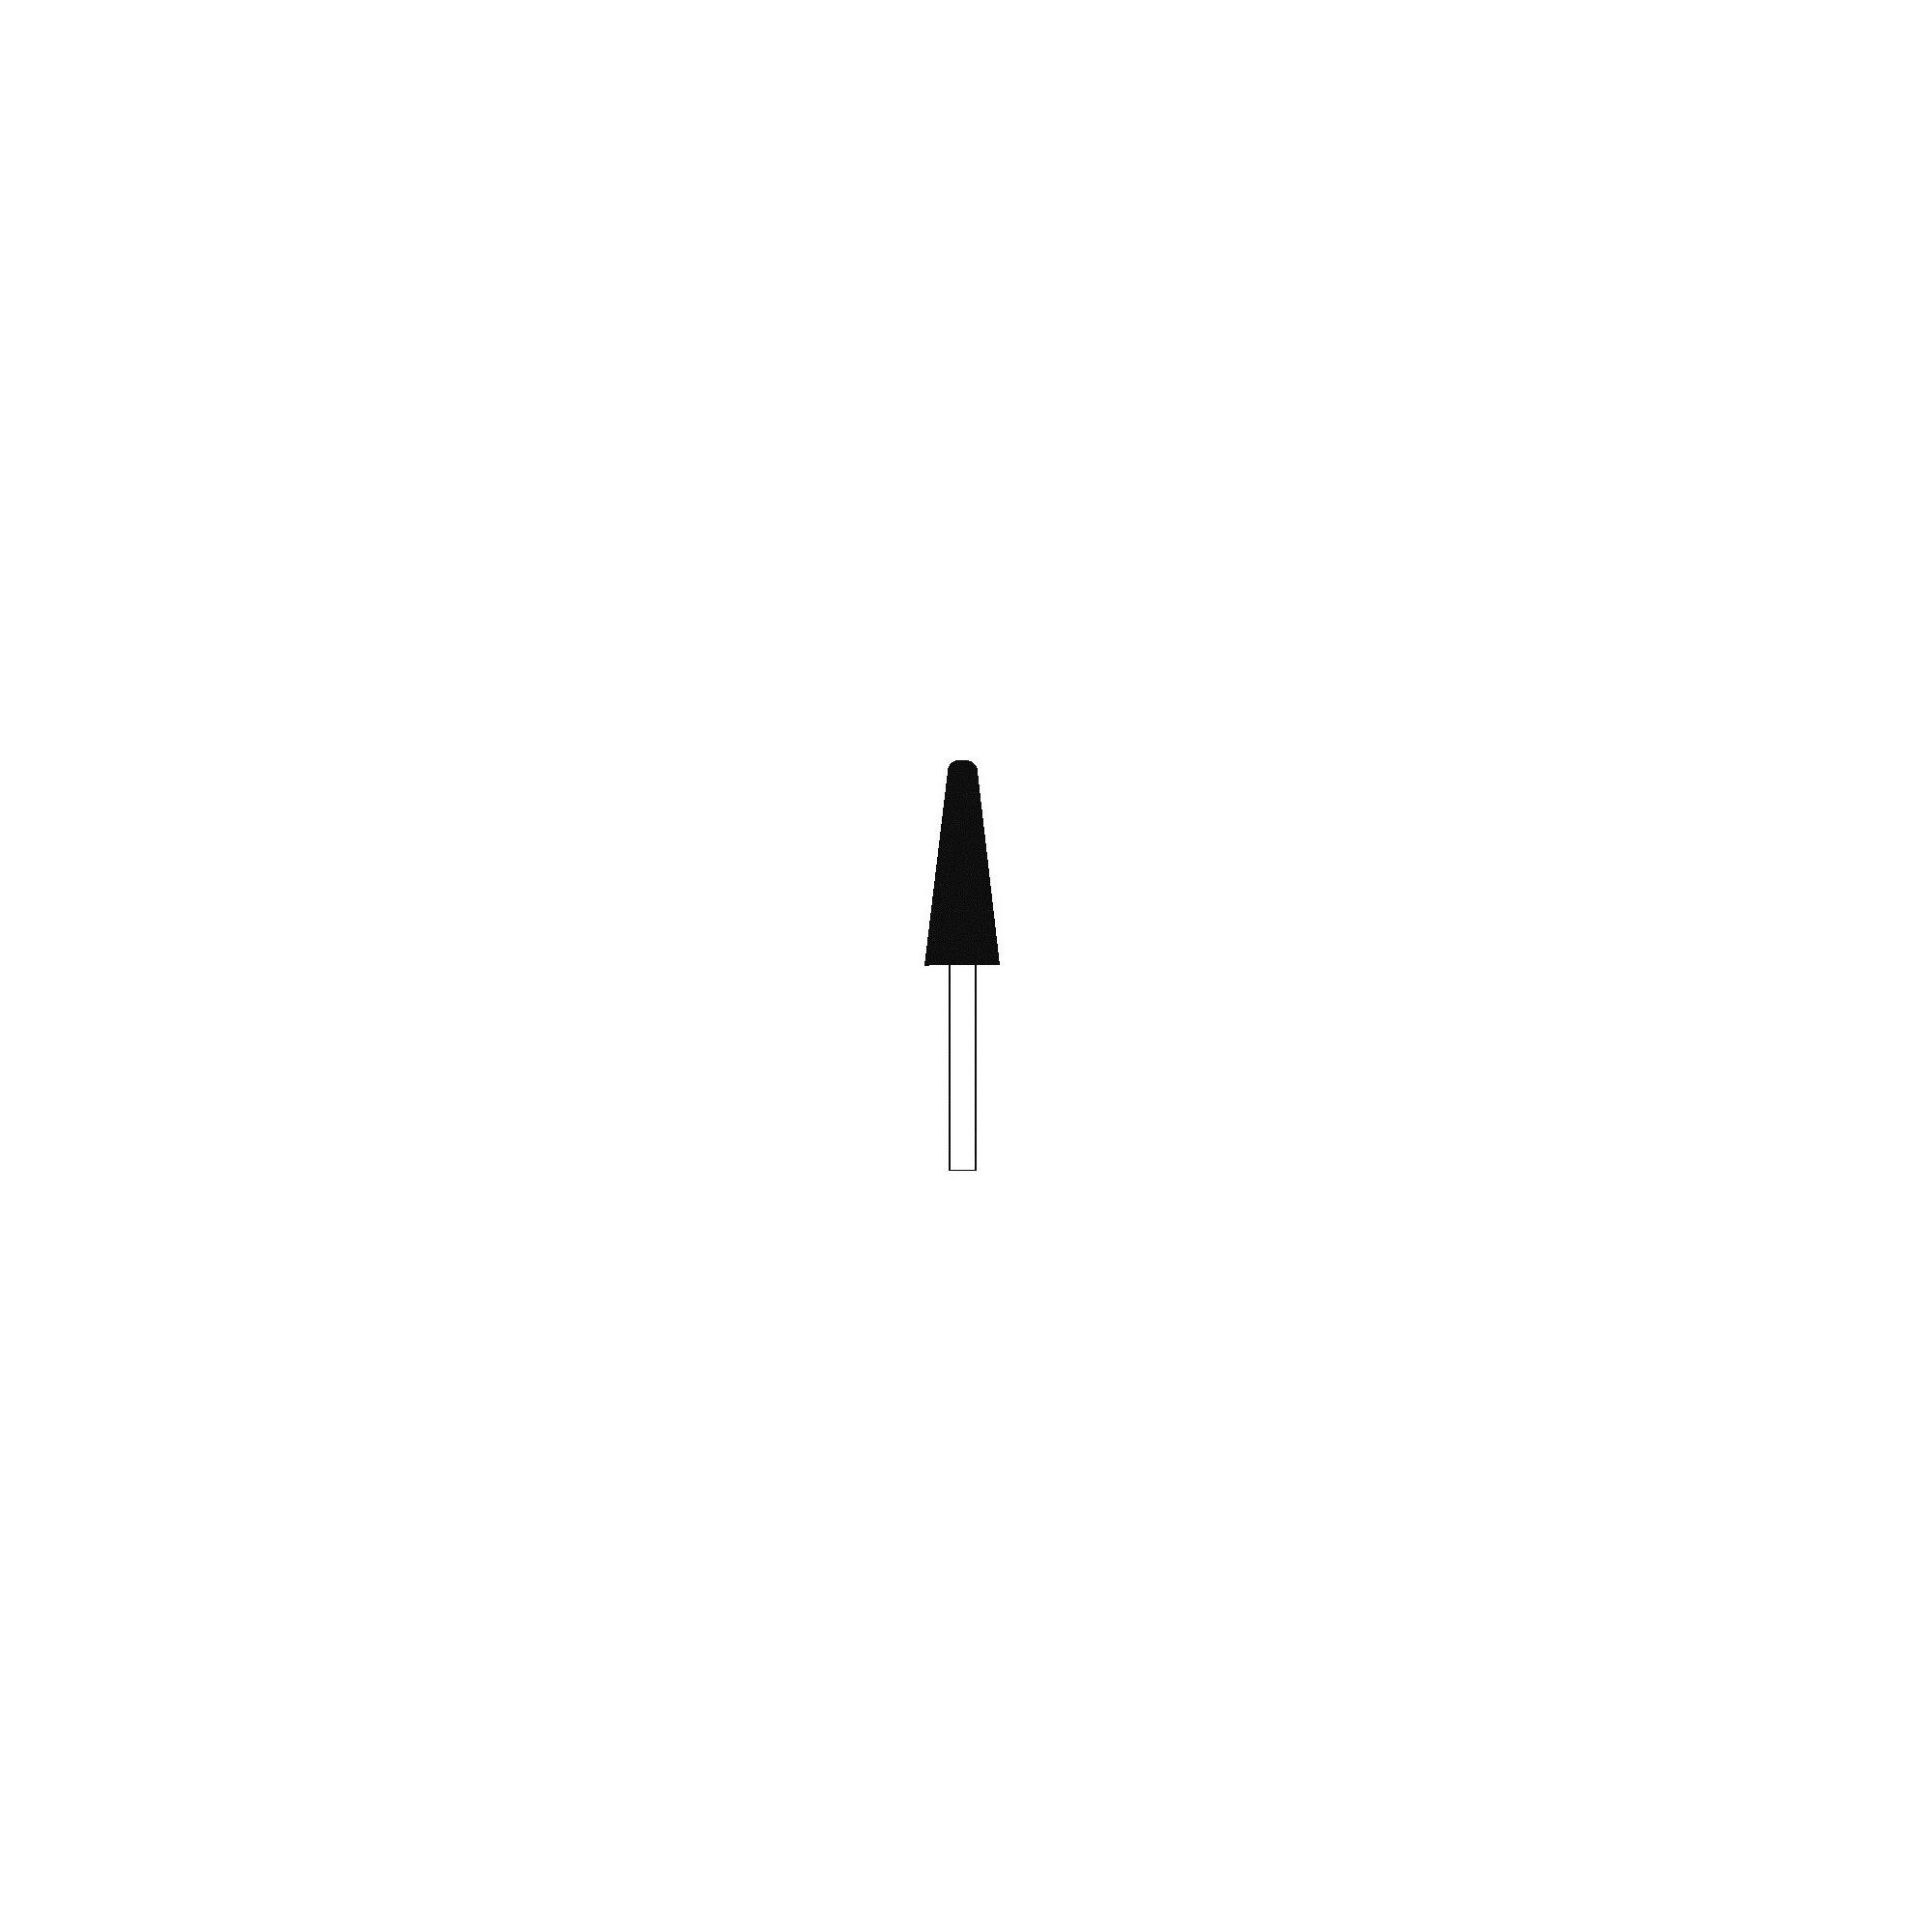 Fraise 45013103 Rubis - Orthoplasties - 2,35mm